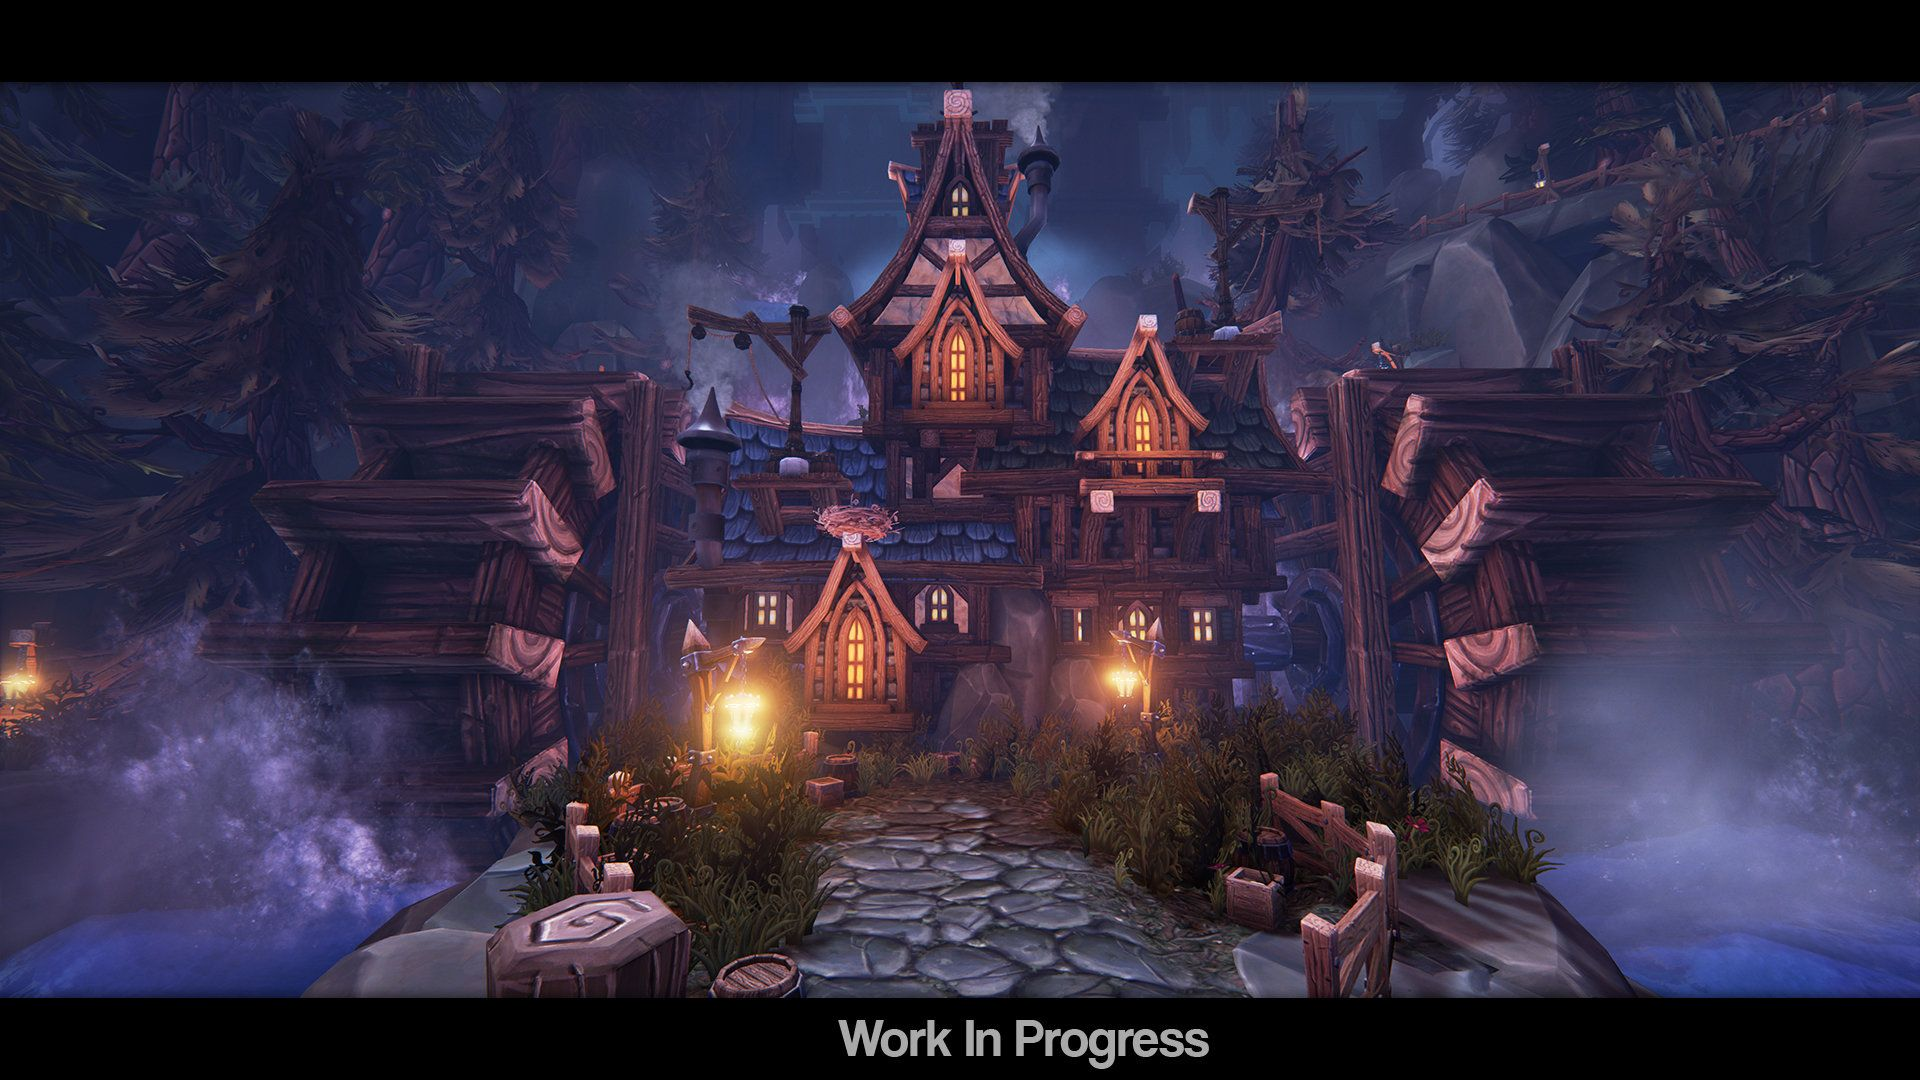 ArtStation Stylized Environment Wip 05, Tobias Koepp